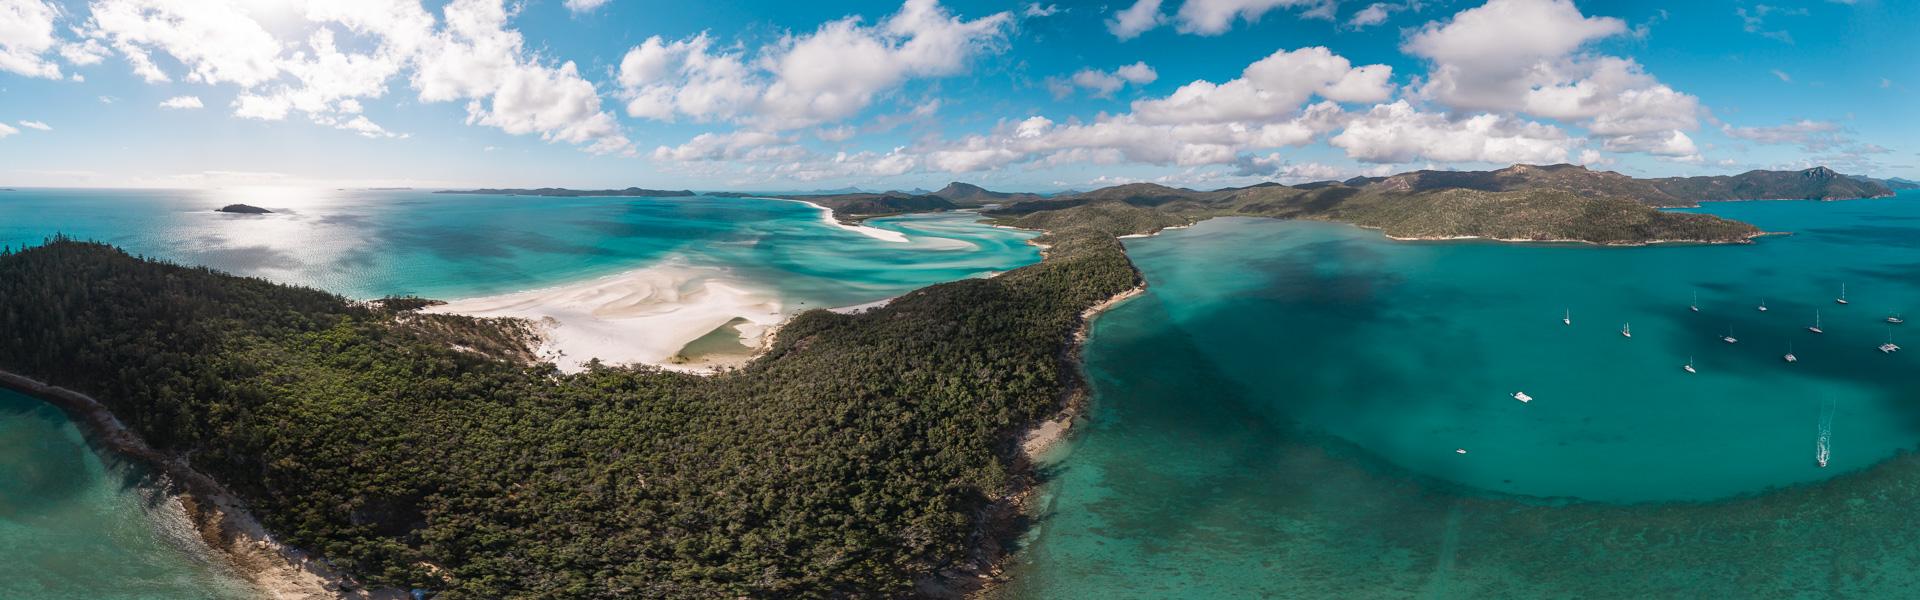 Whitsundays Cruise includes Whitehaven Beach